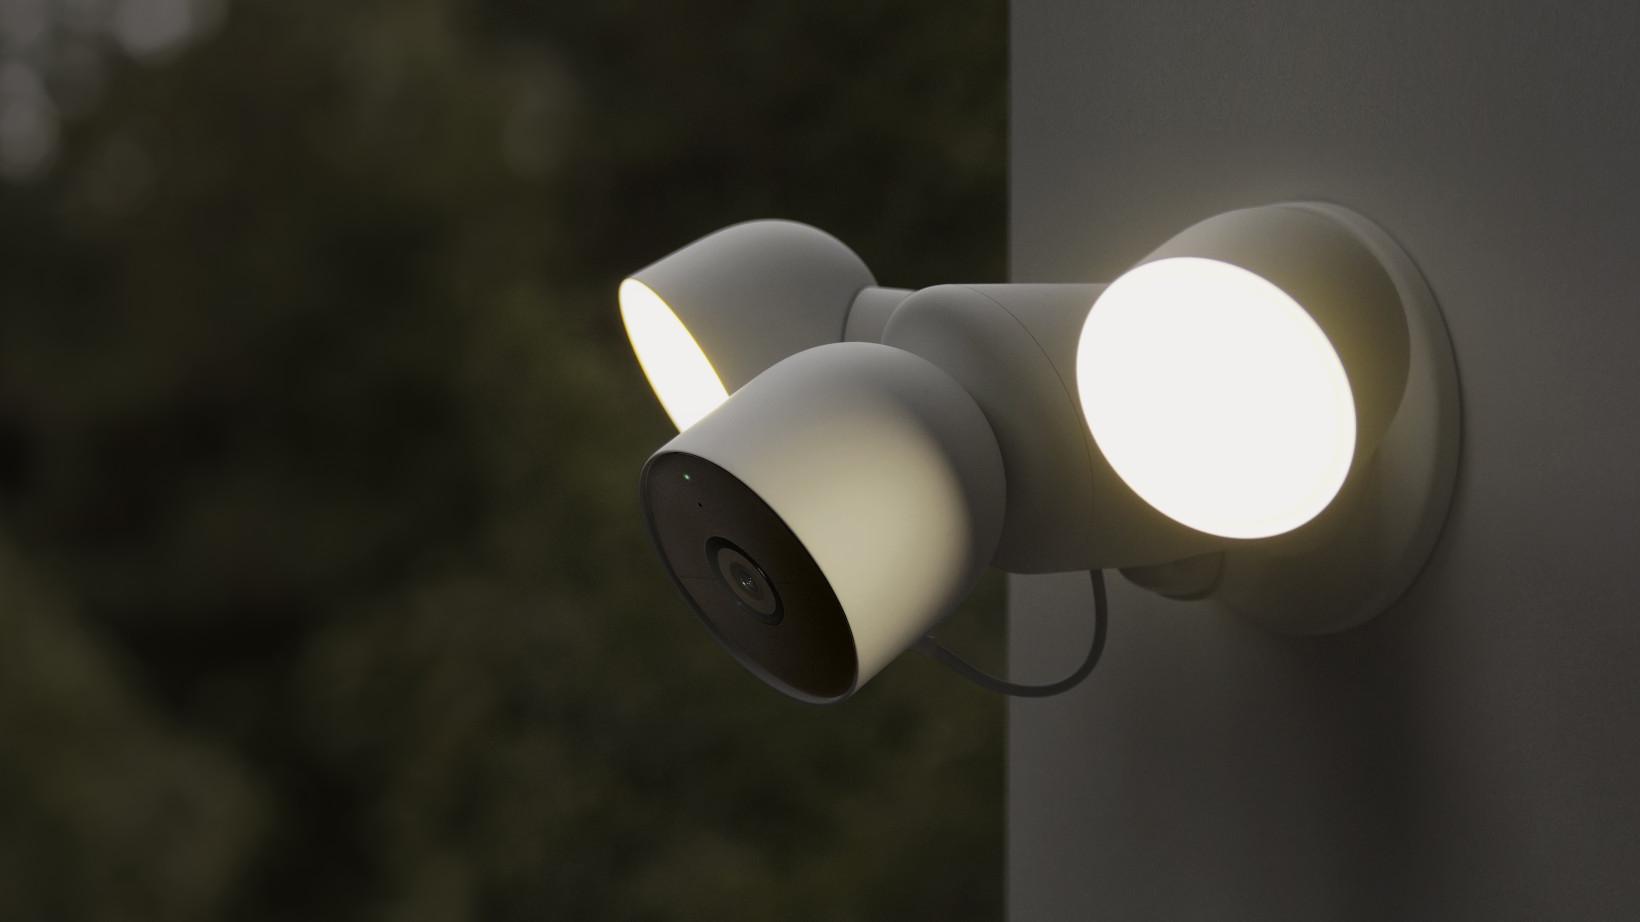 Nest Cam Floodlight